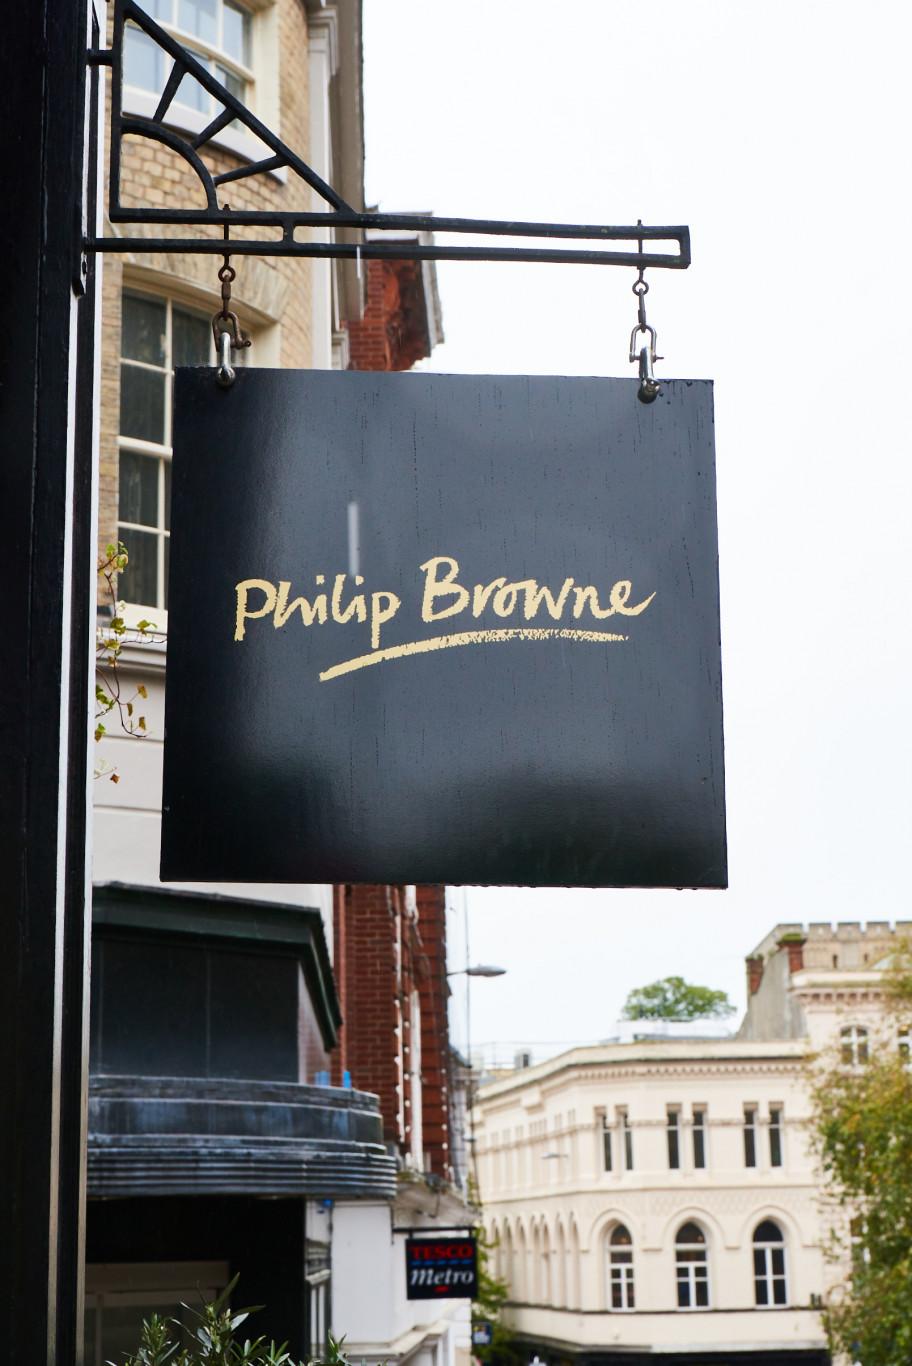 Menswear Launch with Philip Browne Menswear